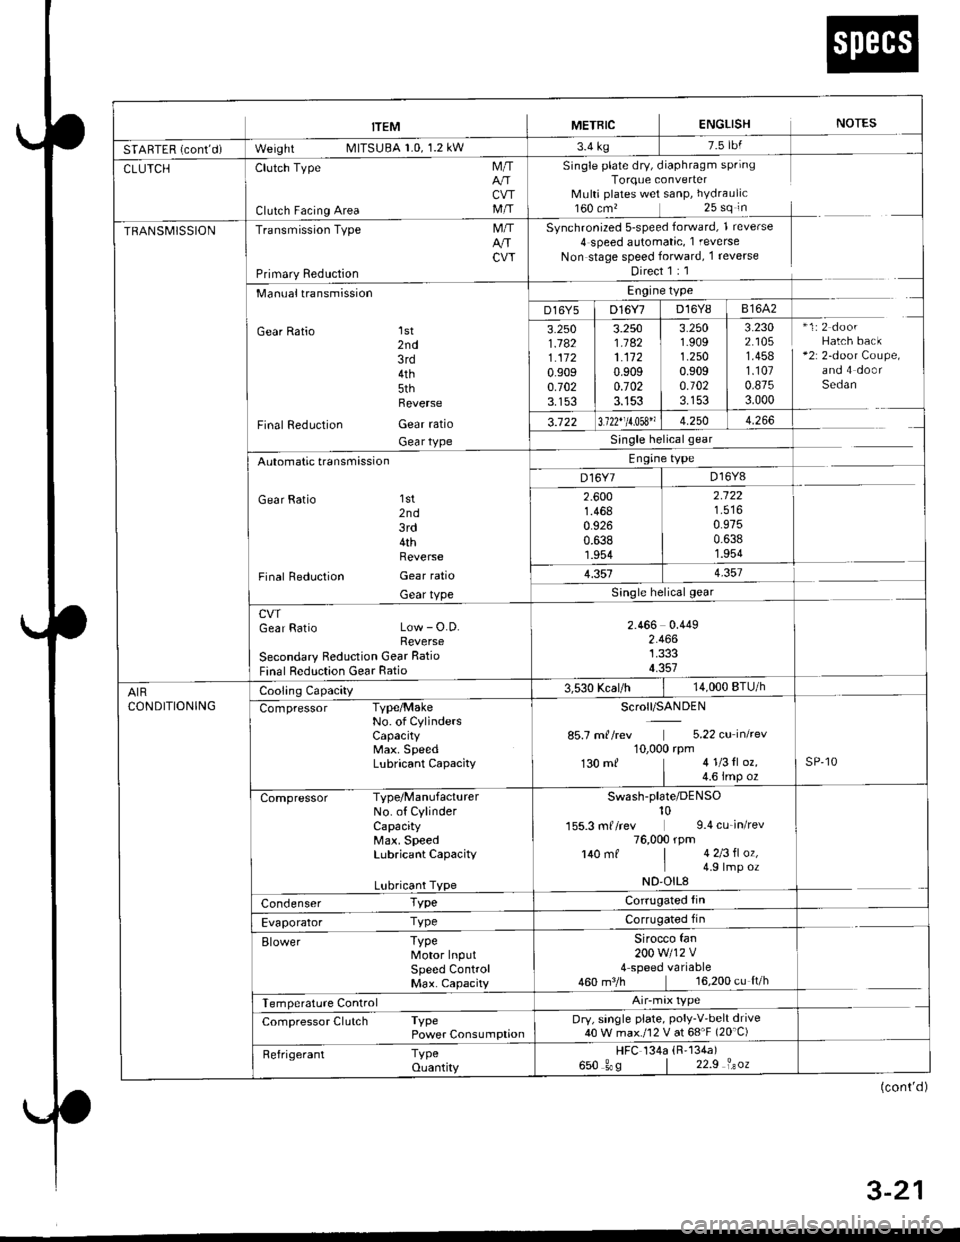 2000 Honda Civic Fuse Box Manual : Honda civic hx fuse diagram amp wiring for bmw e